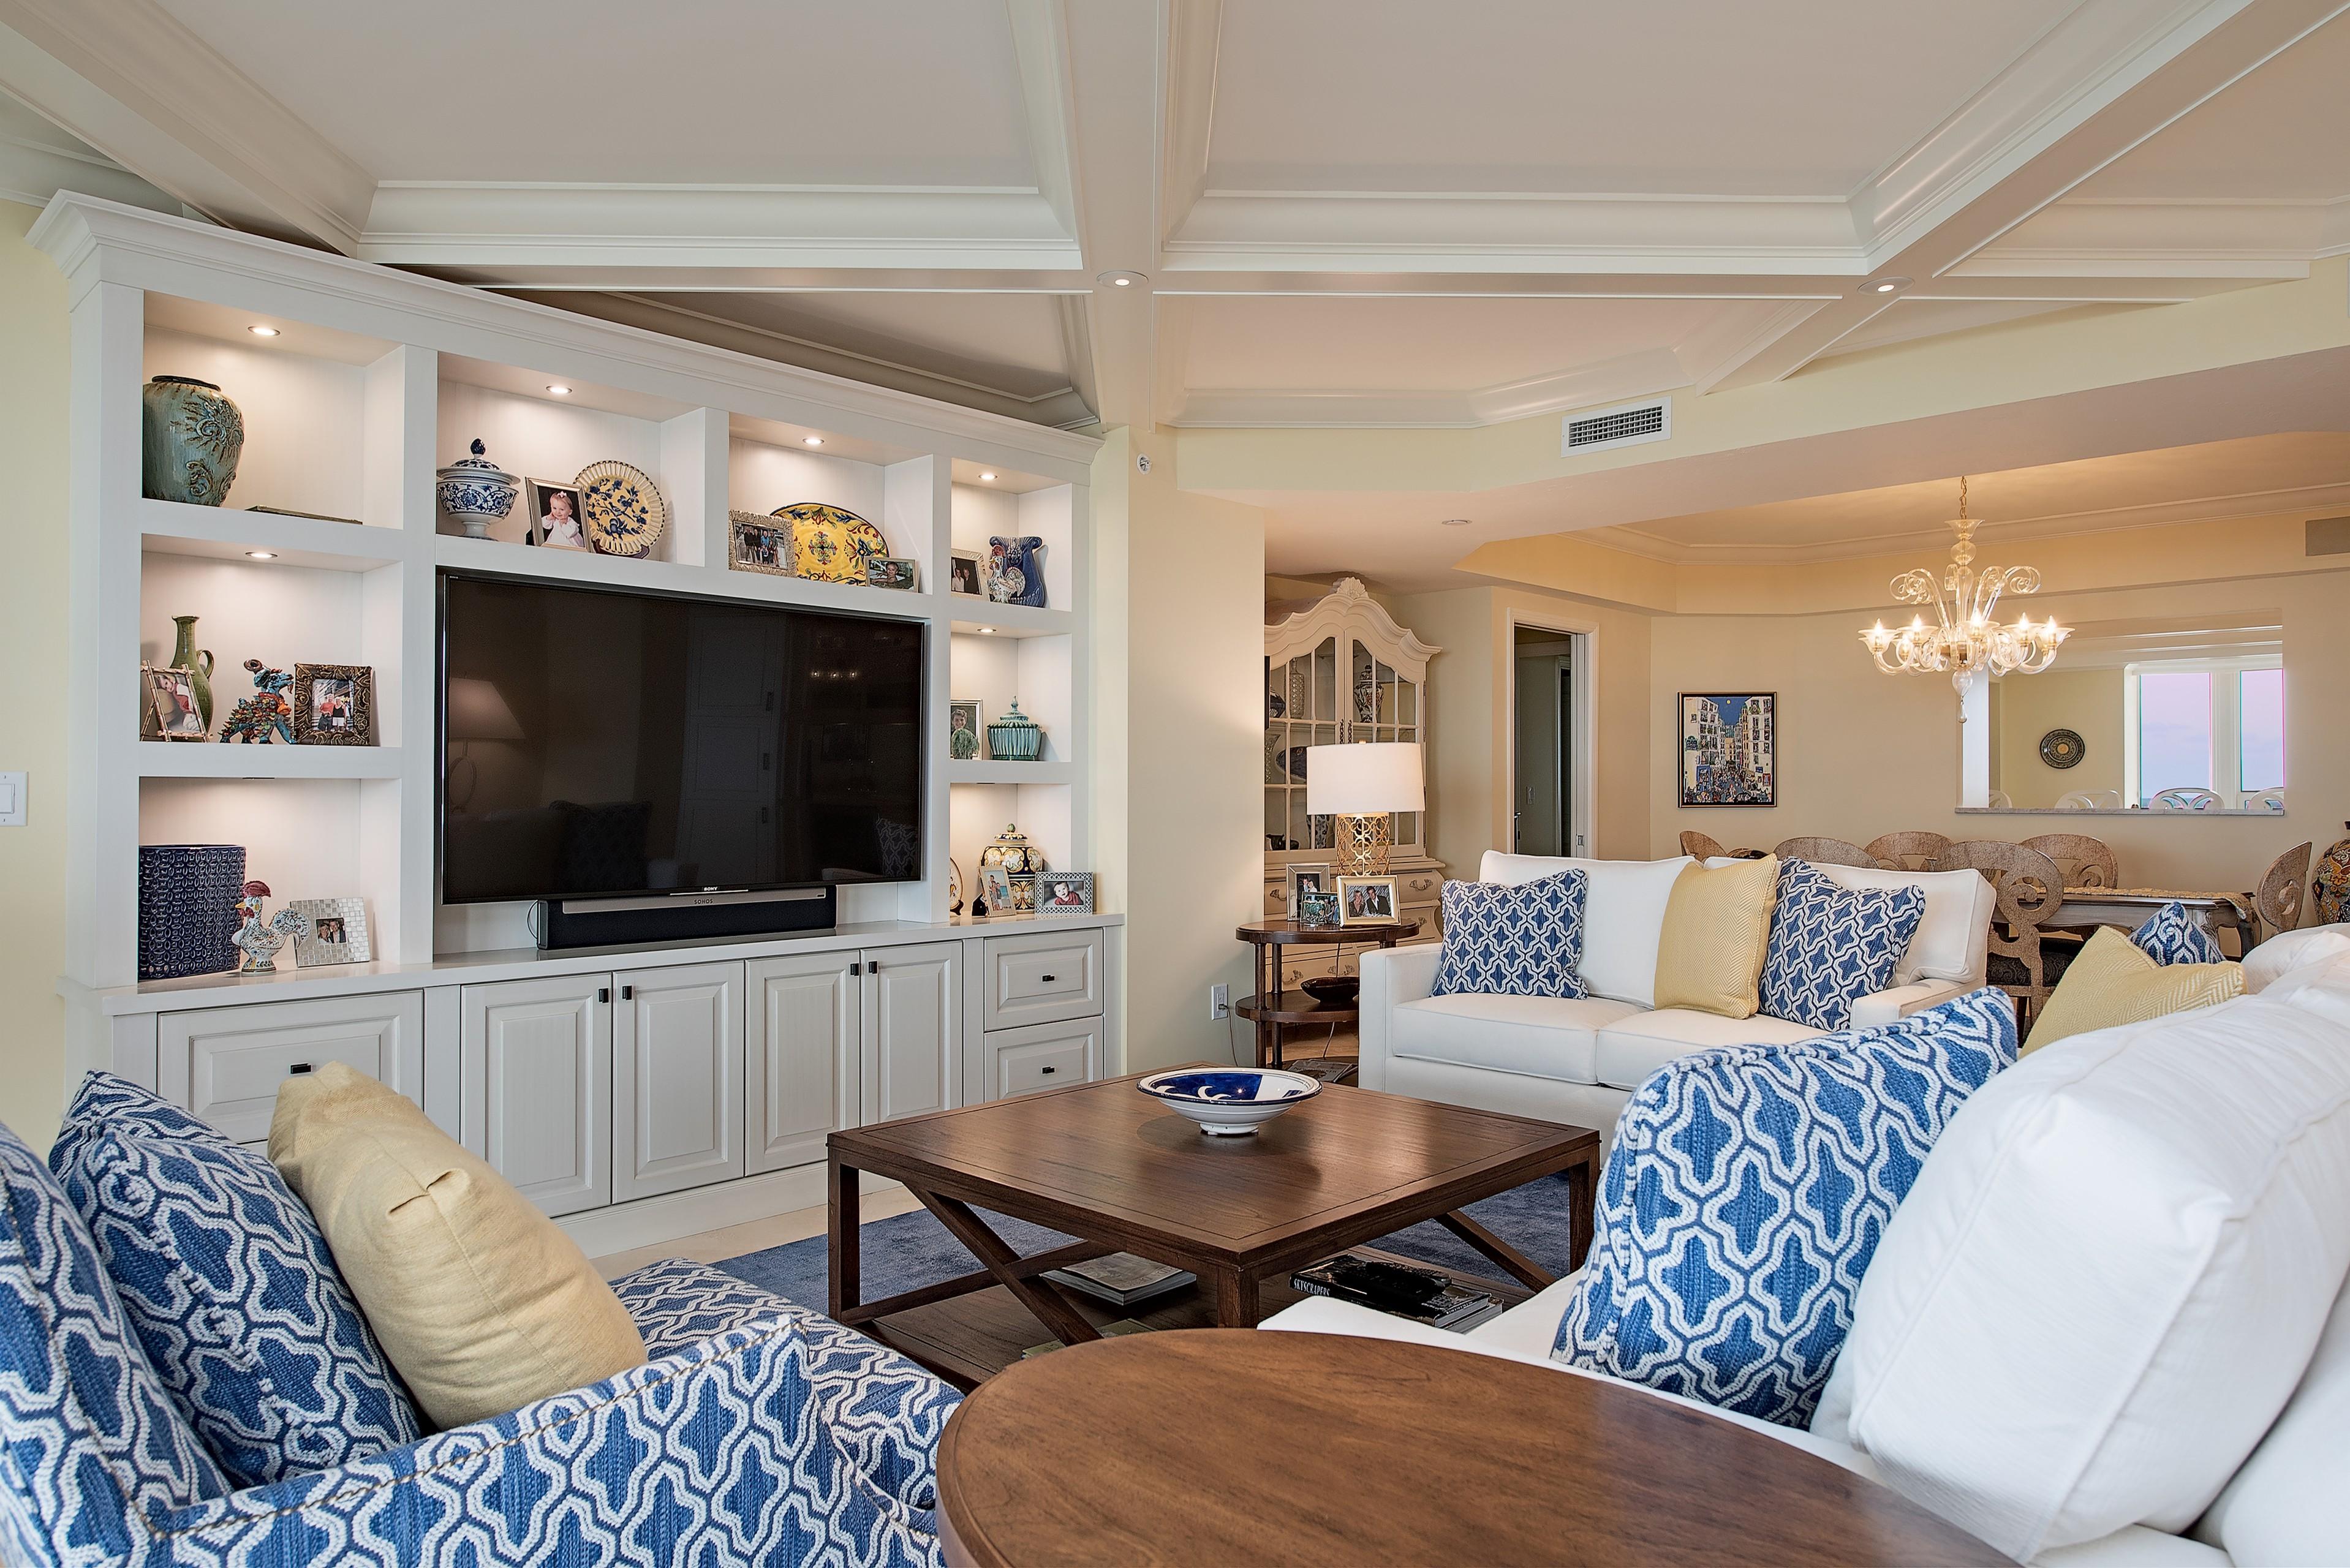 Certified Luxury Builders-41 West-Naples-Pelican Bay-St. Raphael-HR Remodel 2